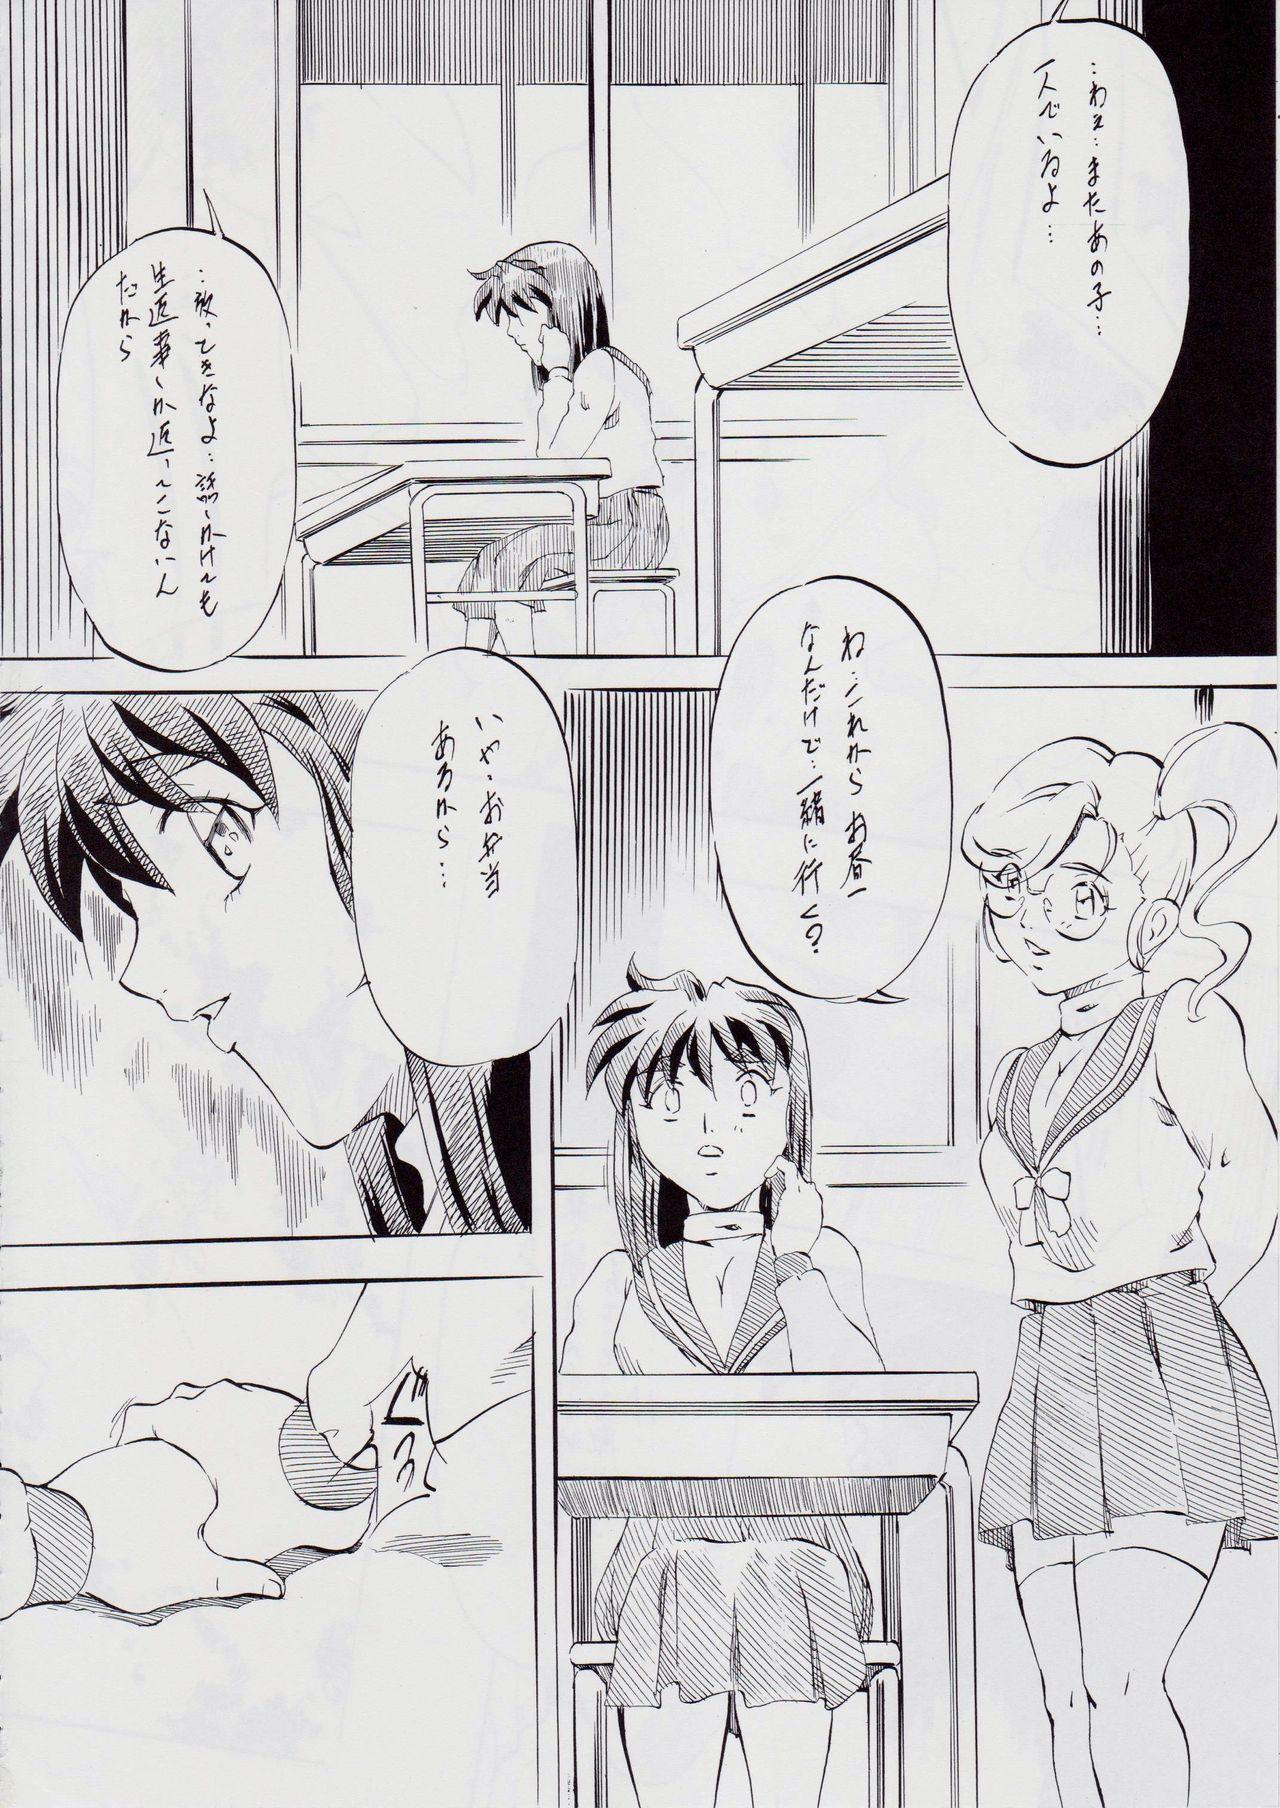 [Busou Megami (Kannaduki Kanna)] 亜衣&麻衣 ~女喰花~ II (Injuu Seisen Twin Angels) 8